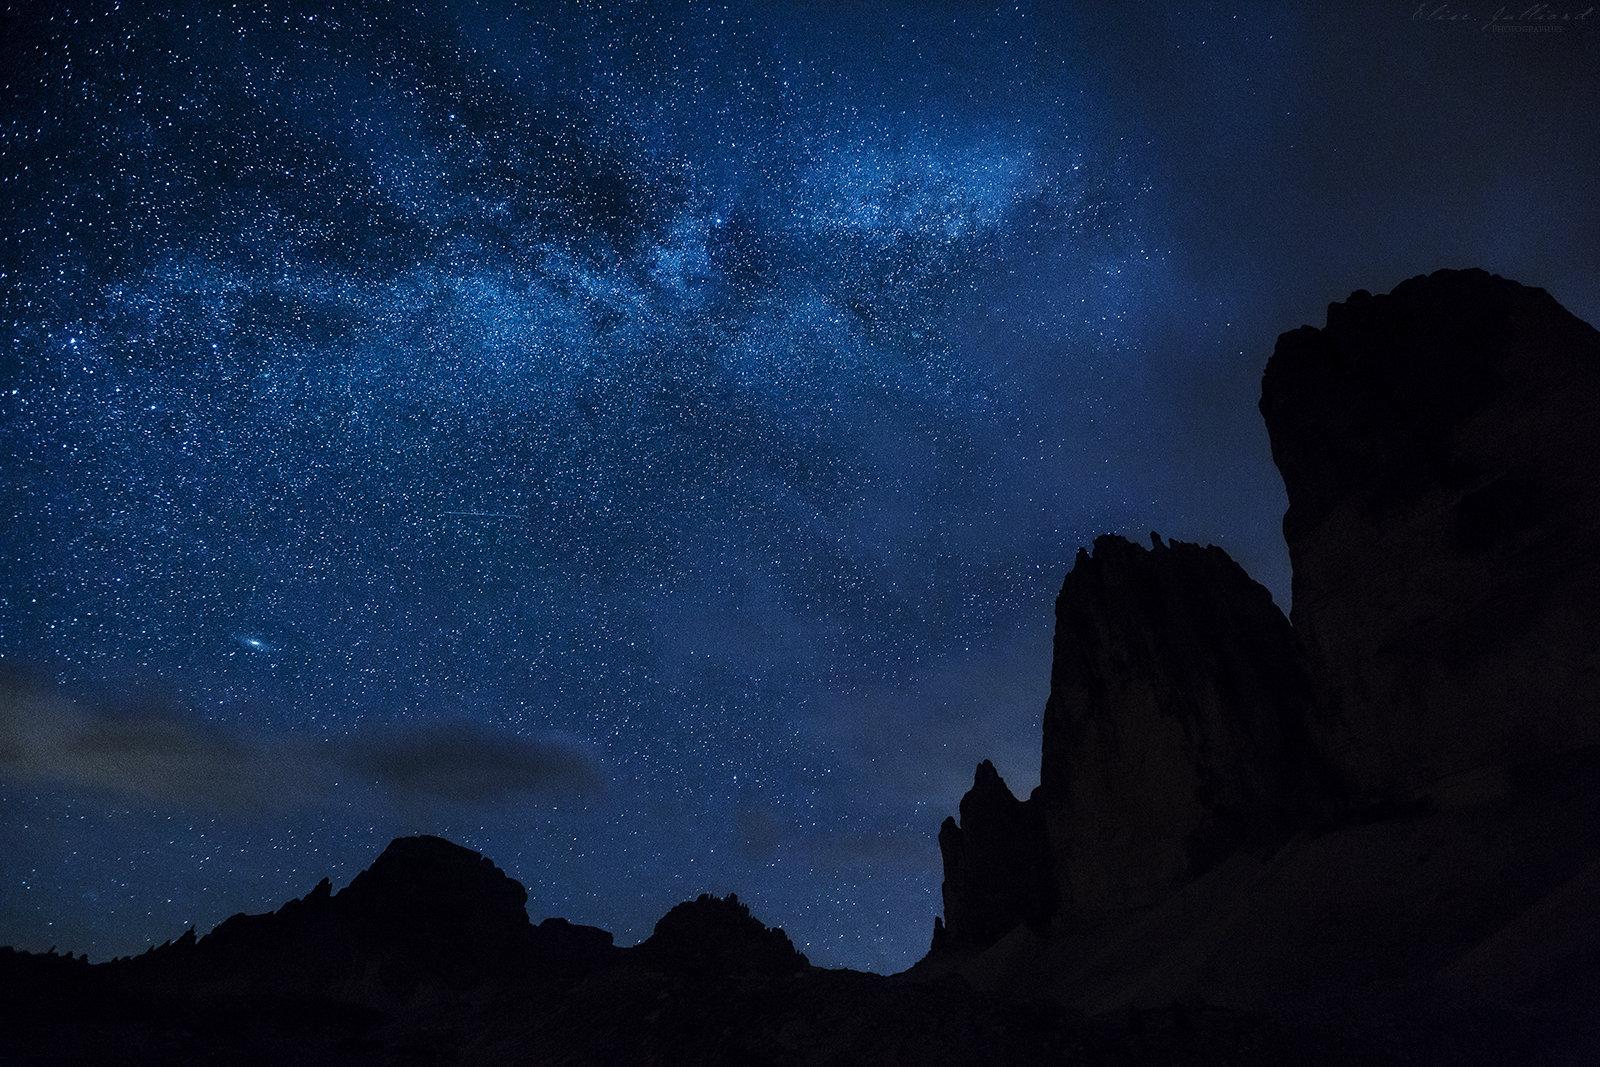 elise-julliard-photographe-lyon-france-montagne-dolomites-dolomiti-italie-paysage-tre-cime-di-lavaredo-nuit-etoile-voie-lactee